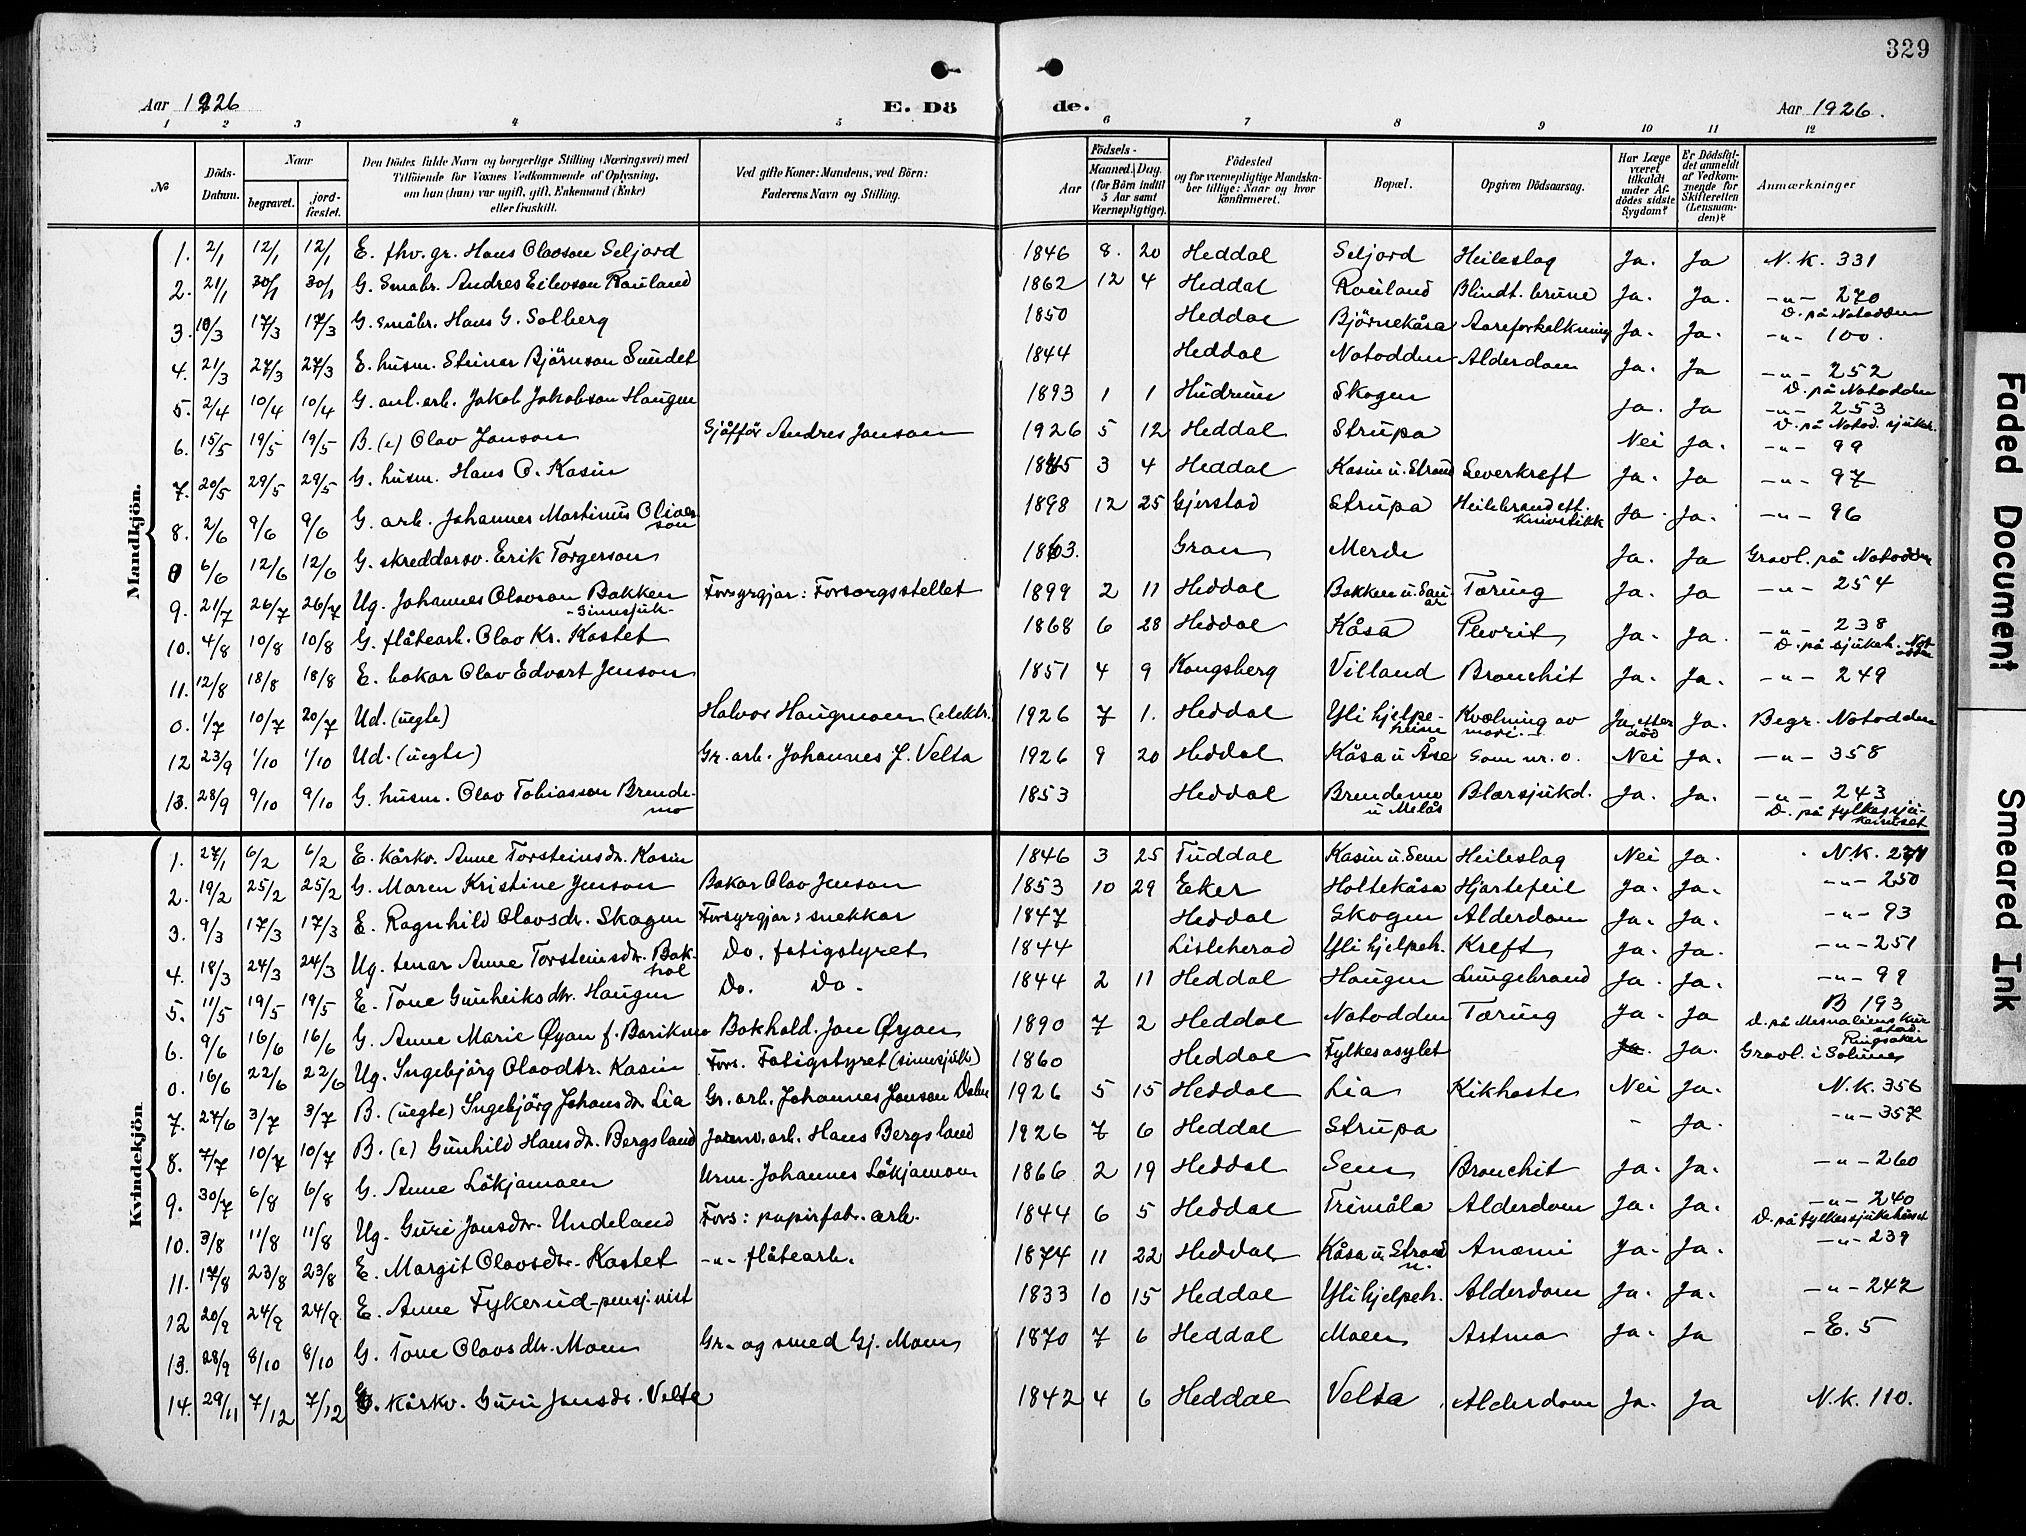 SAKO, Heddal kirkebøker, G/Ga/L0003: Klokkerbok nr. I 3, 1908-1932, s. 329